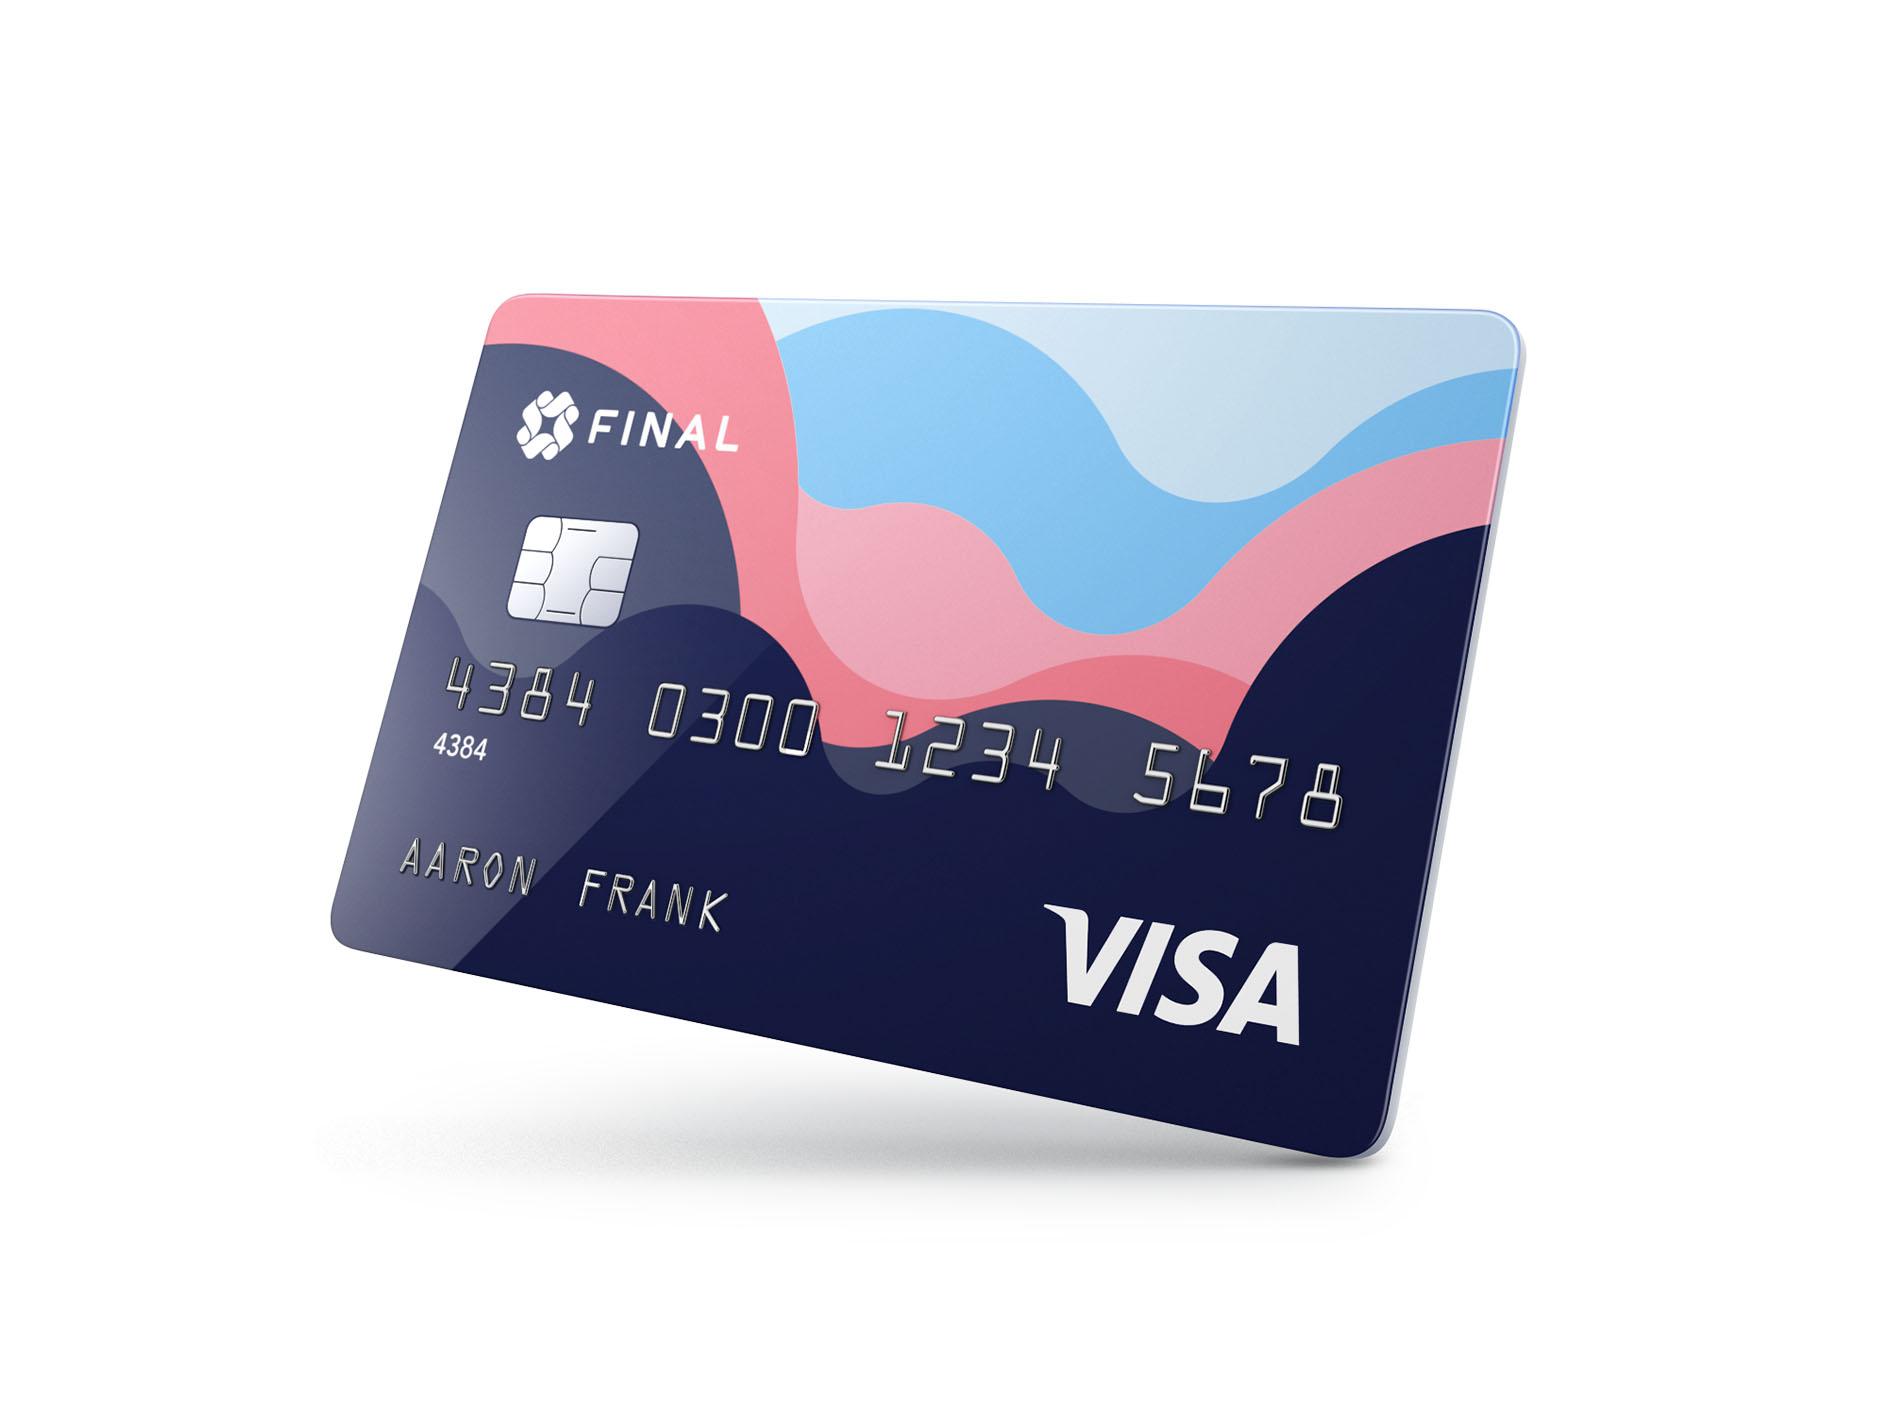 final credit card